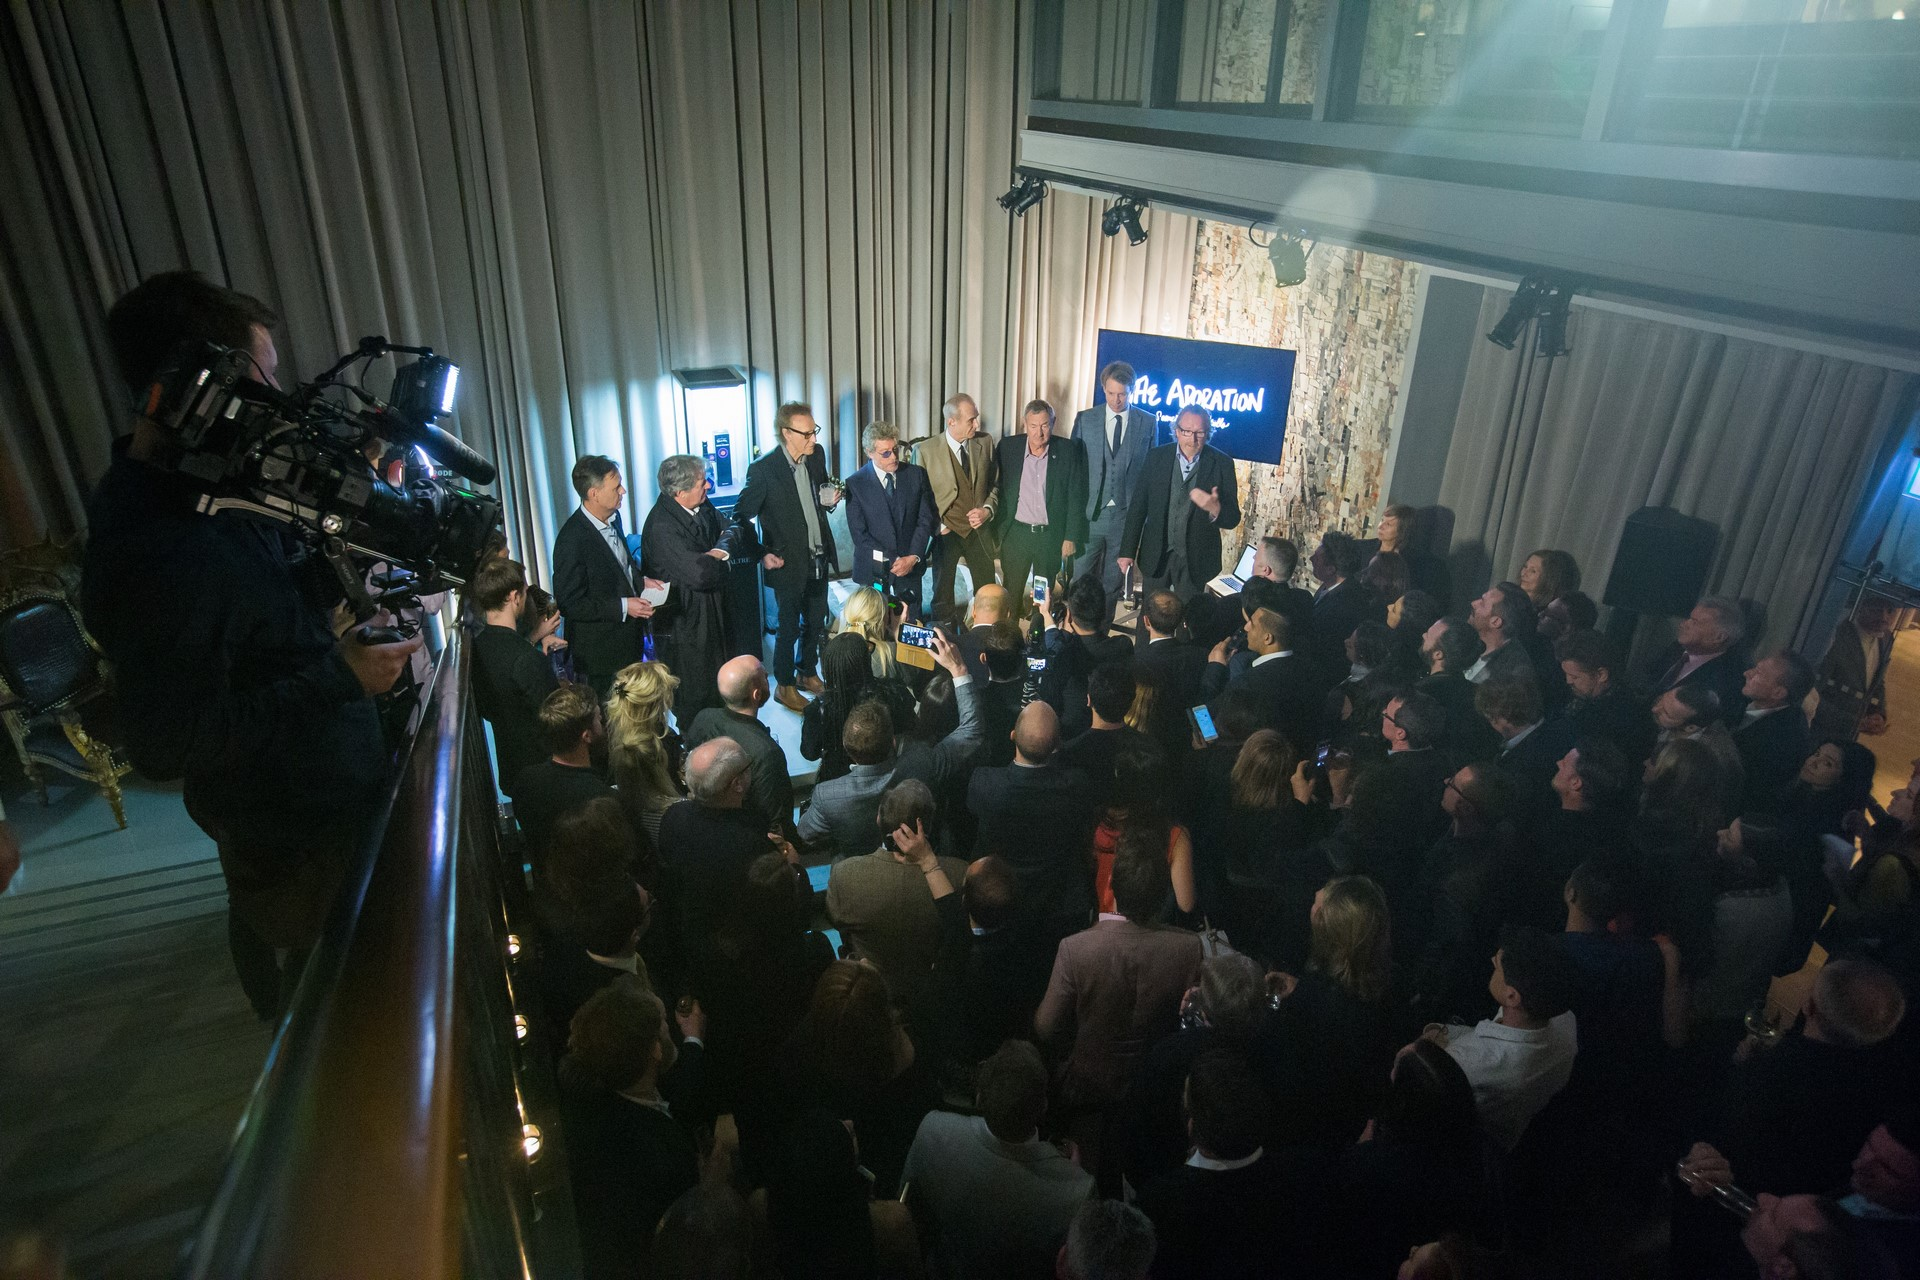 29/03/2017 - Ciaran McCrickard/Mindworks - RRMC Auction car launch, London